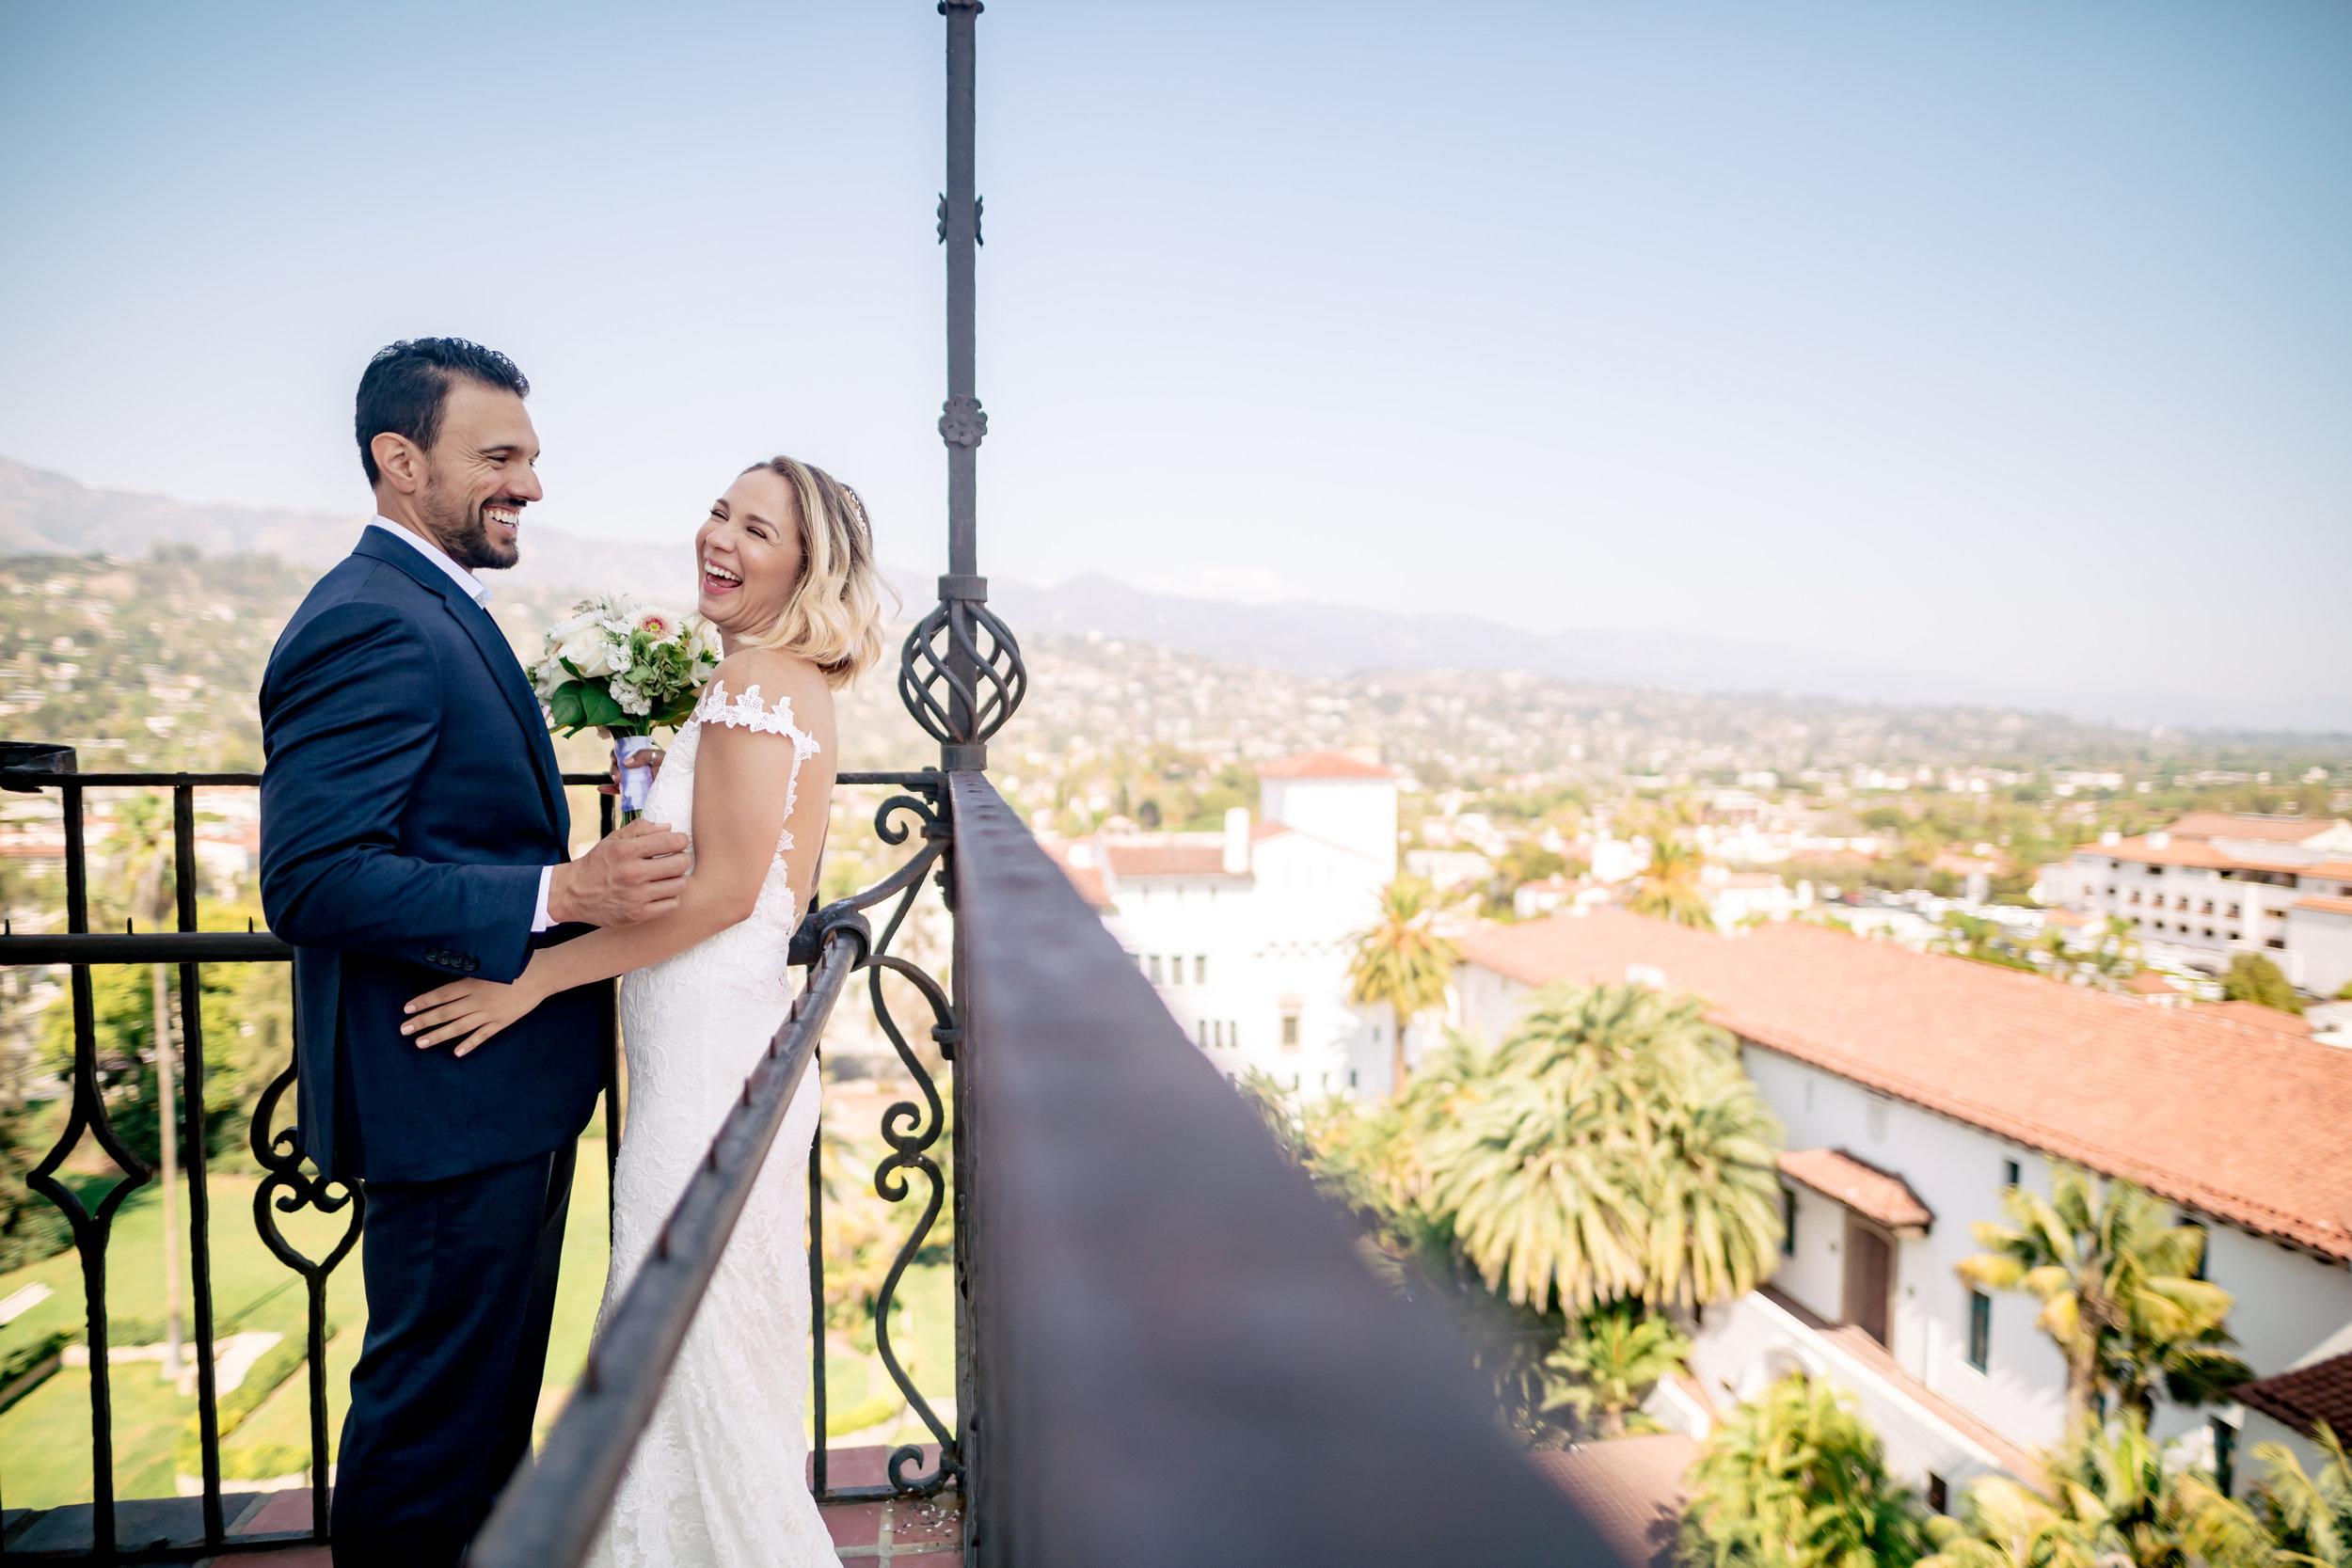 www.santabarbarawedding.com   Rewind Photography   Santa Barbara Courthouse   Elopement   Bride and Groom